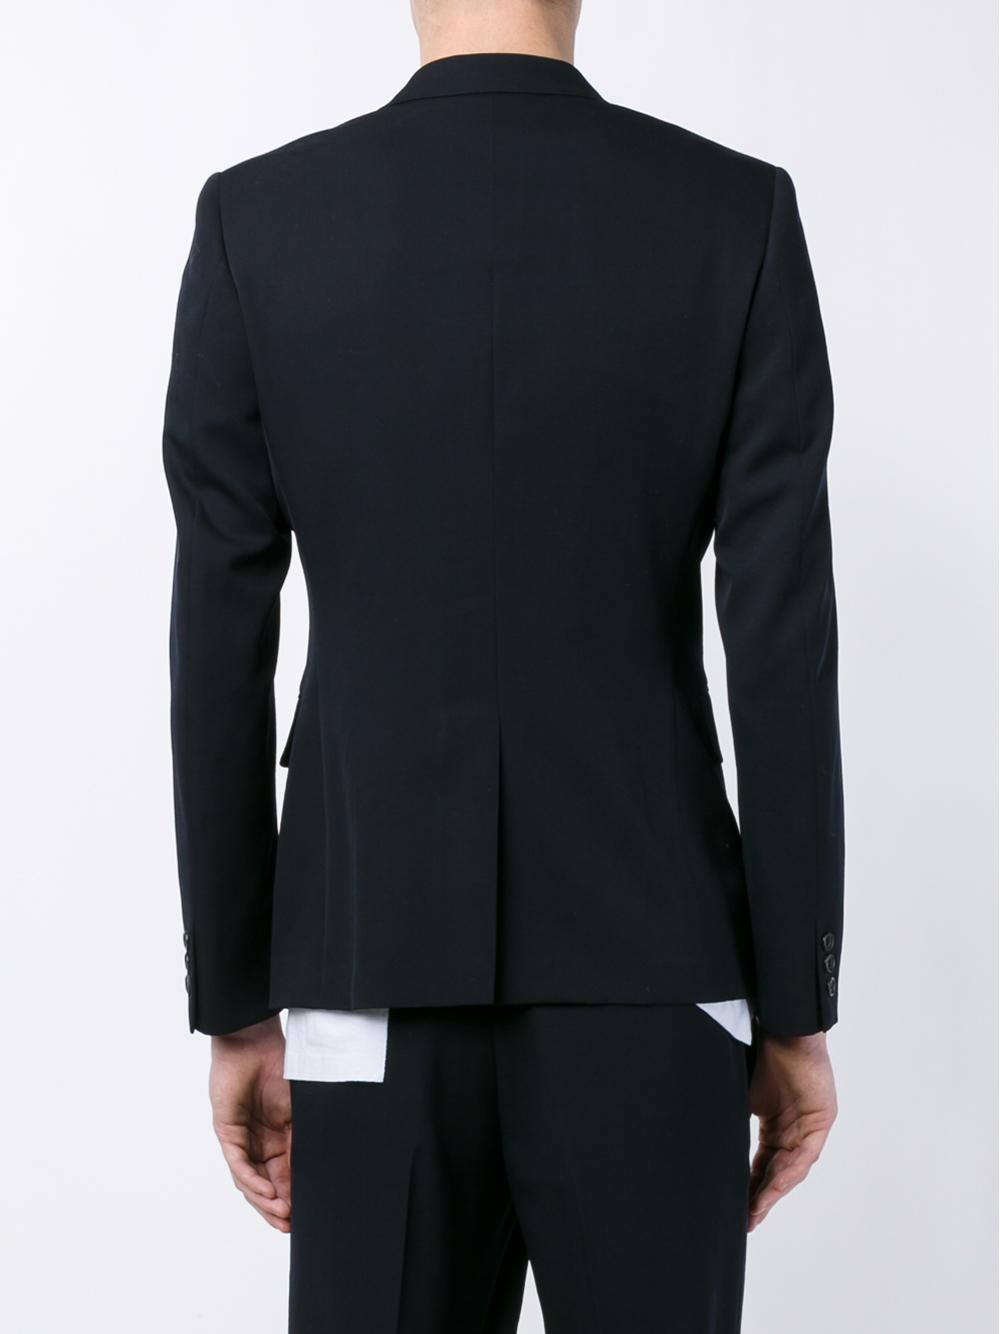 Comme des Garçons Wool Blazer in Navy (Blue) for Men